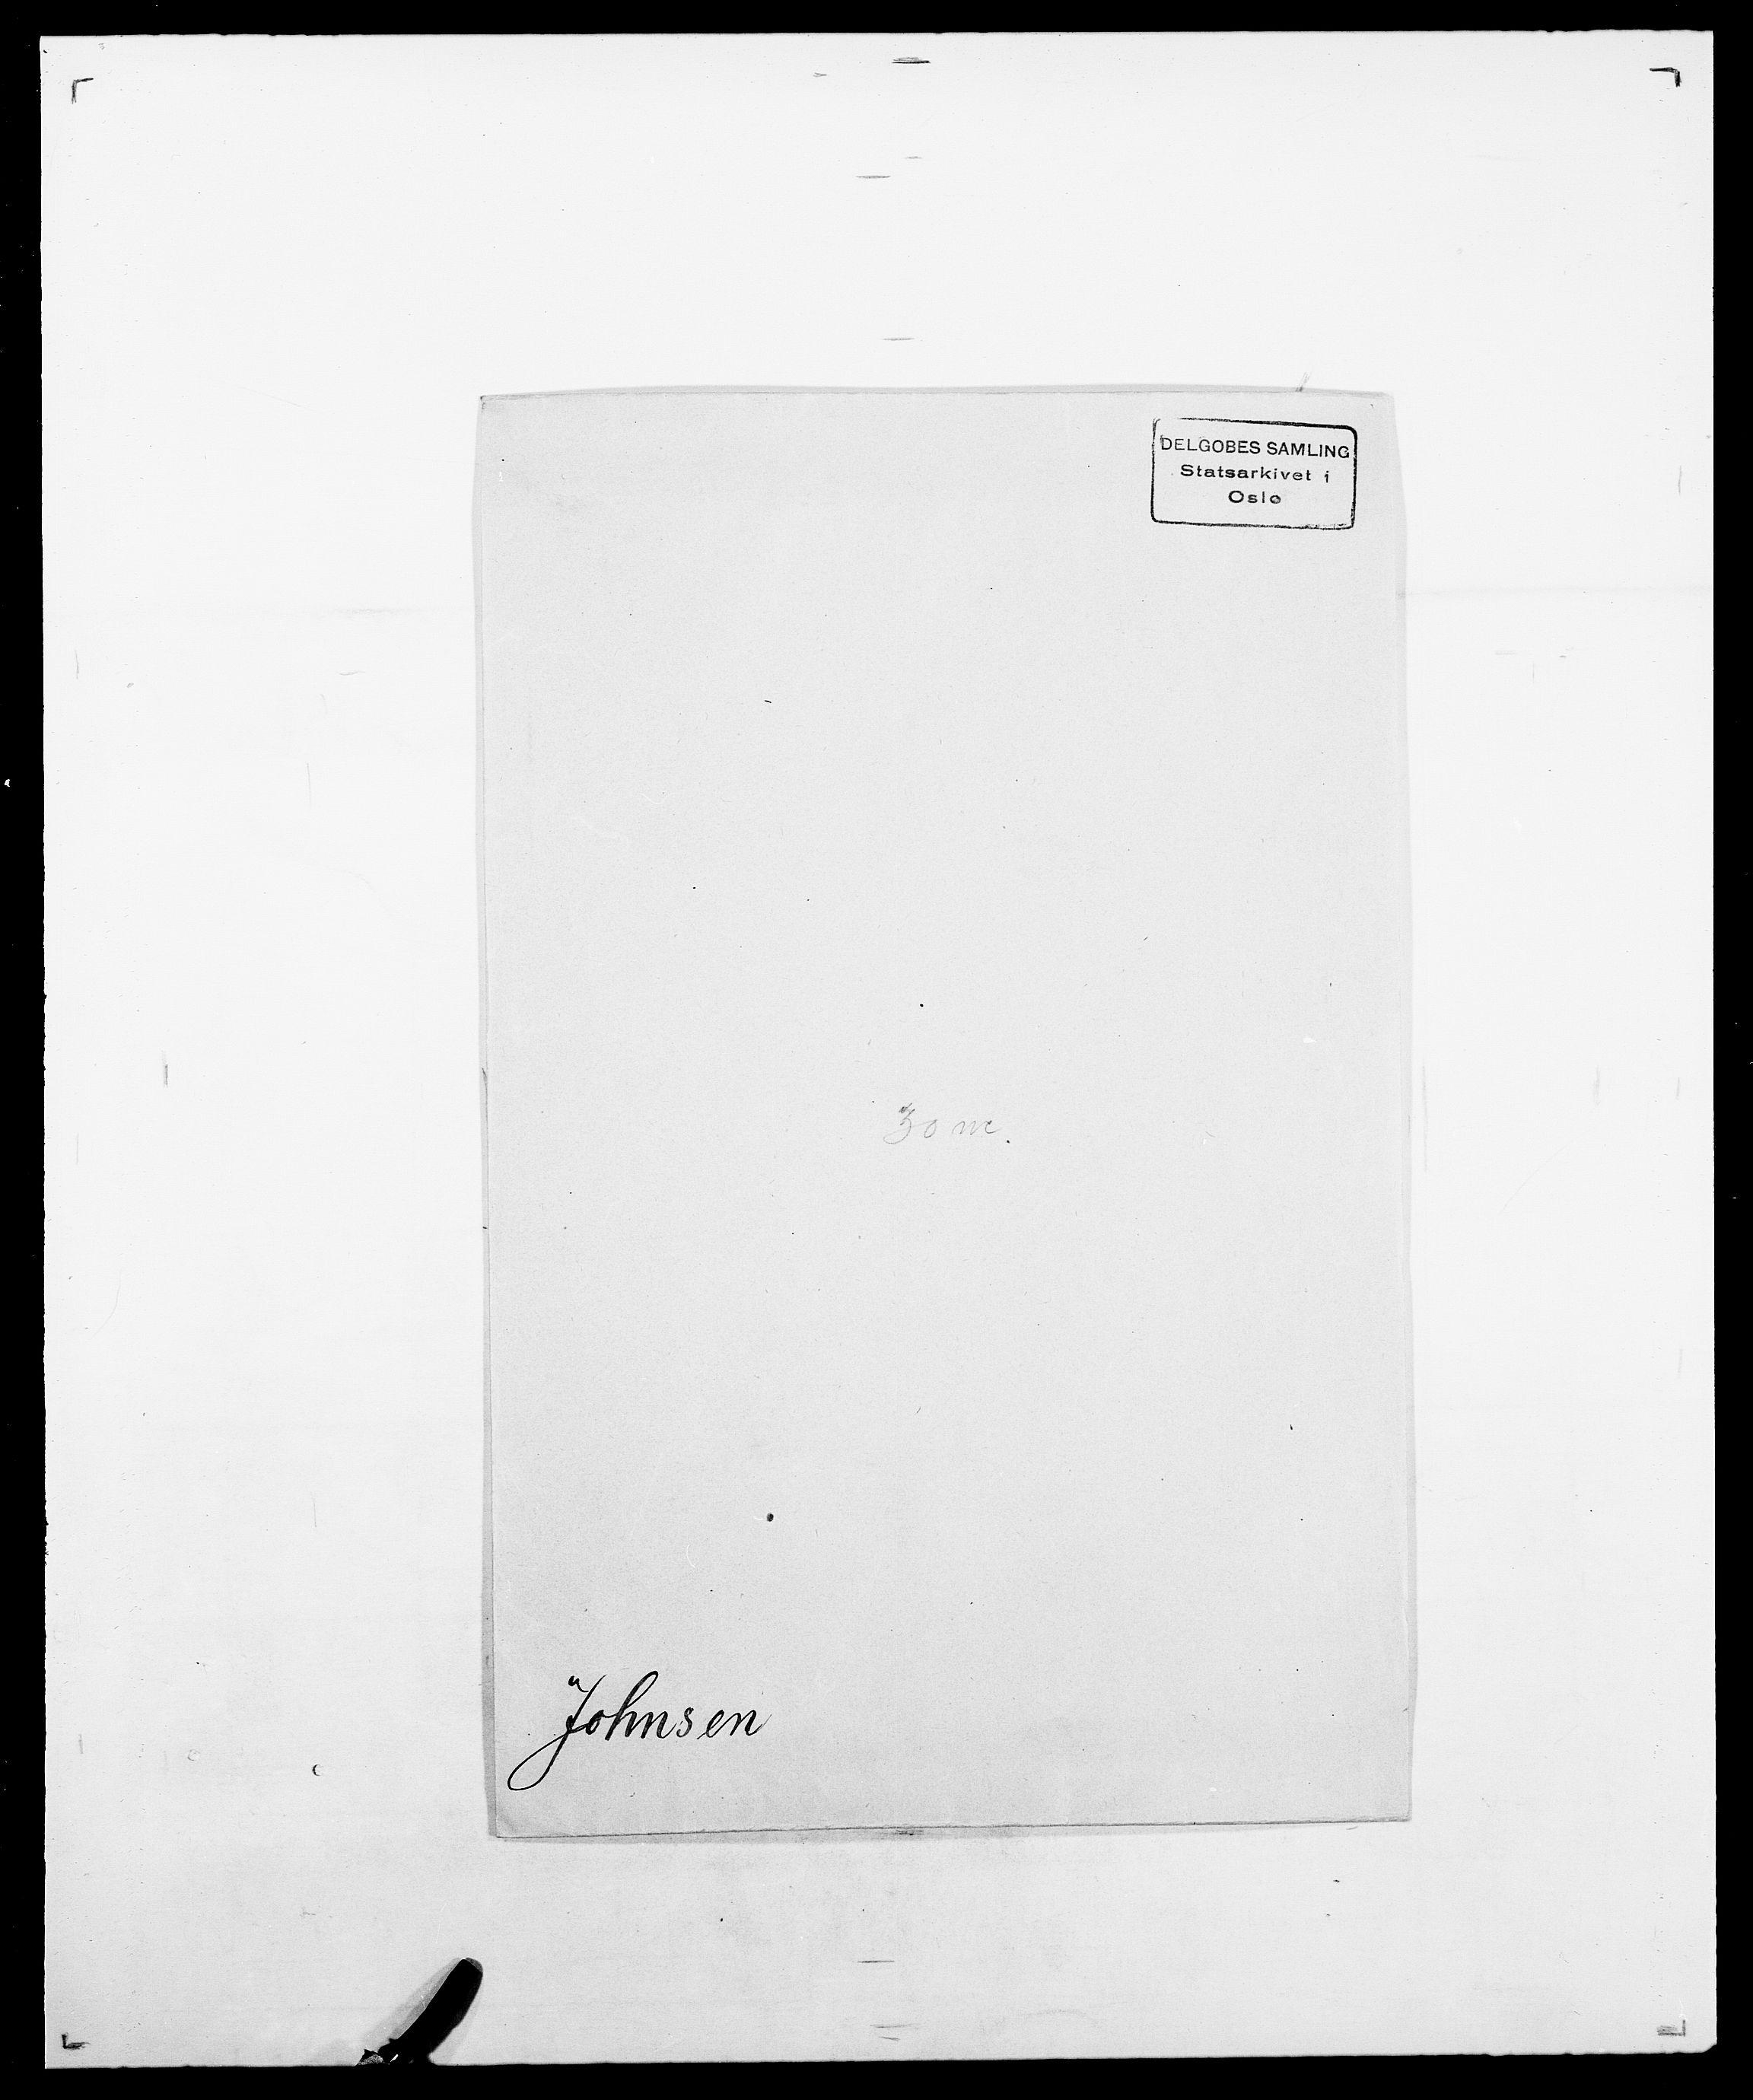 SAO, Delgobe, Charles Antoine - samling, D/Da/L0019: van der Hude - Joys, s. 829